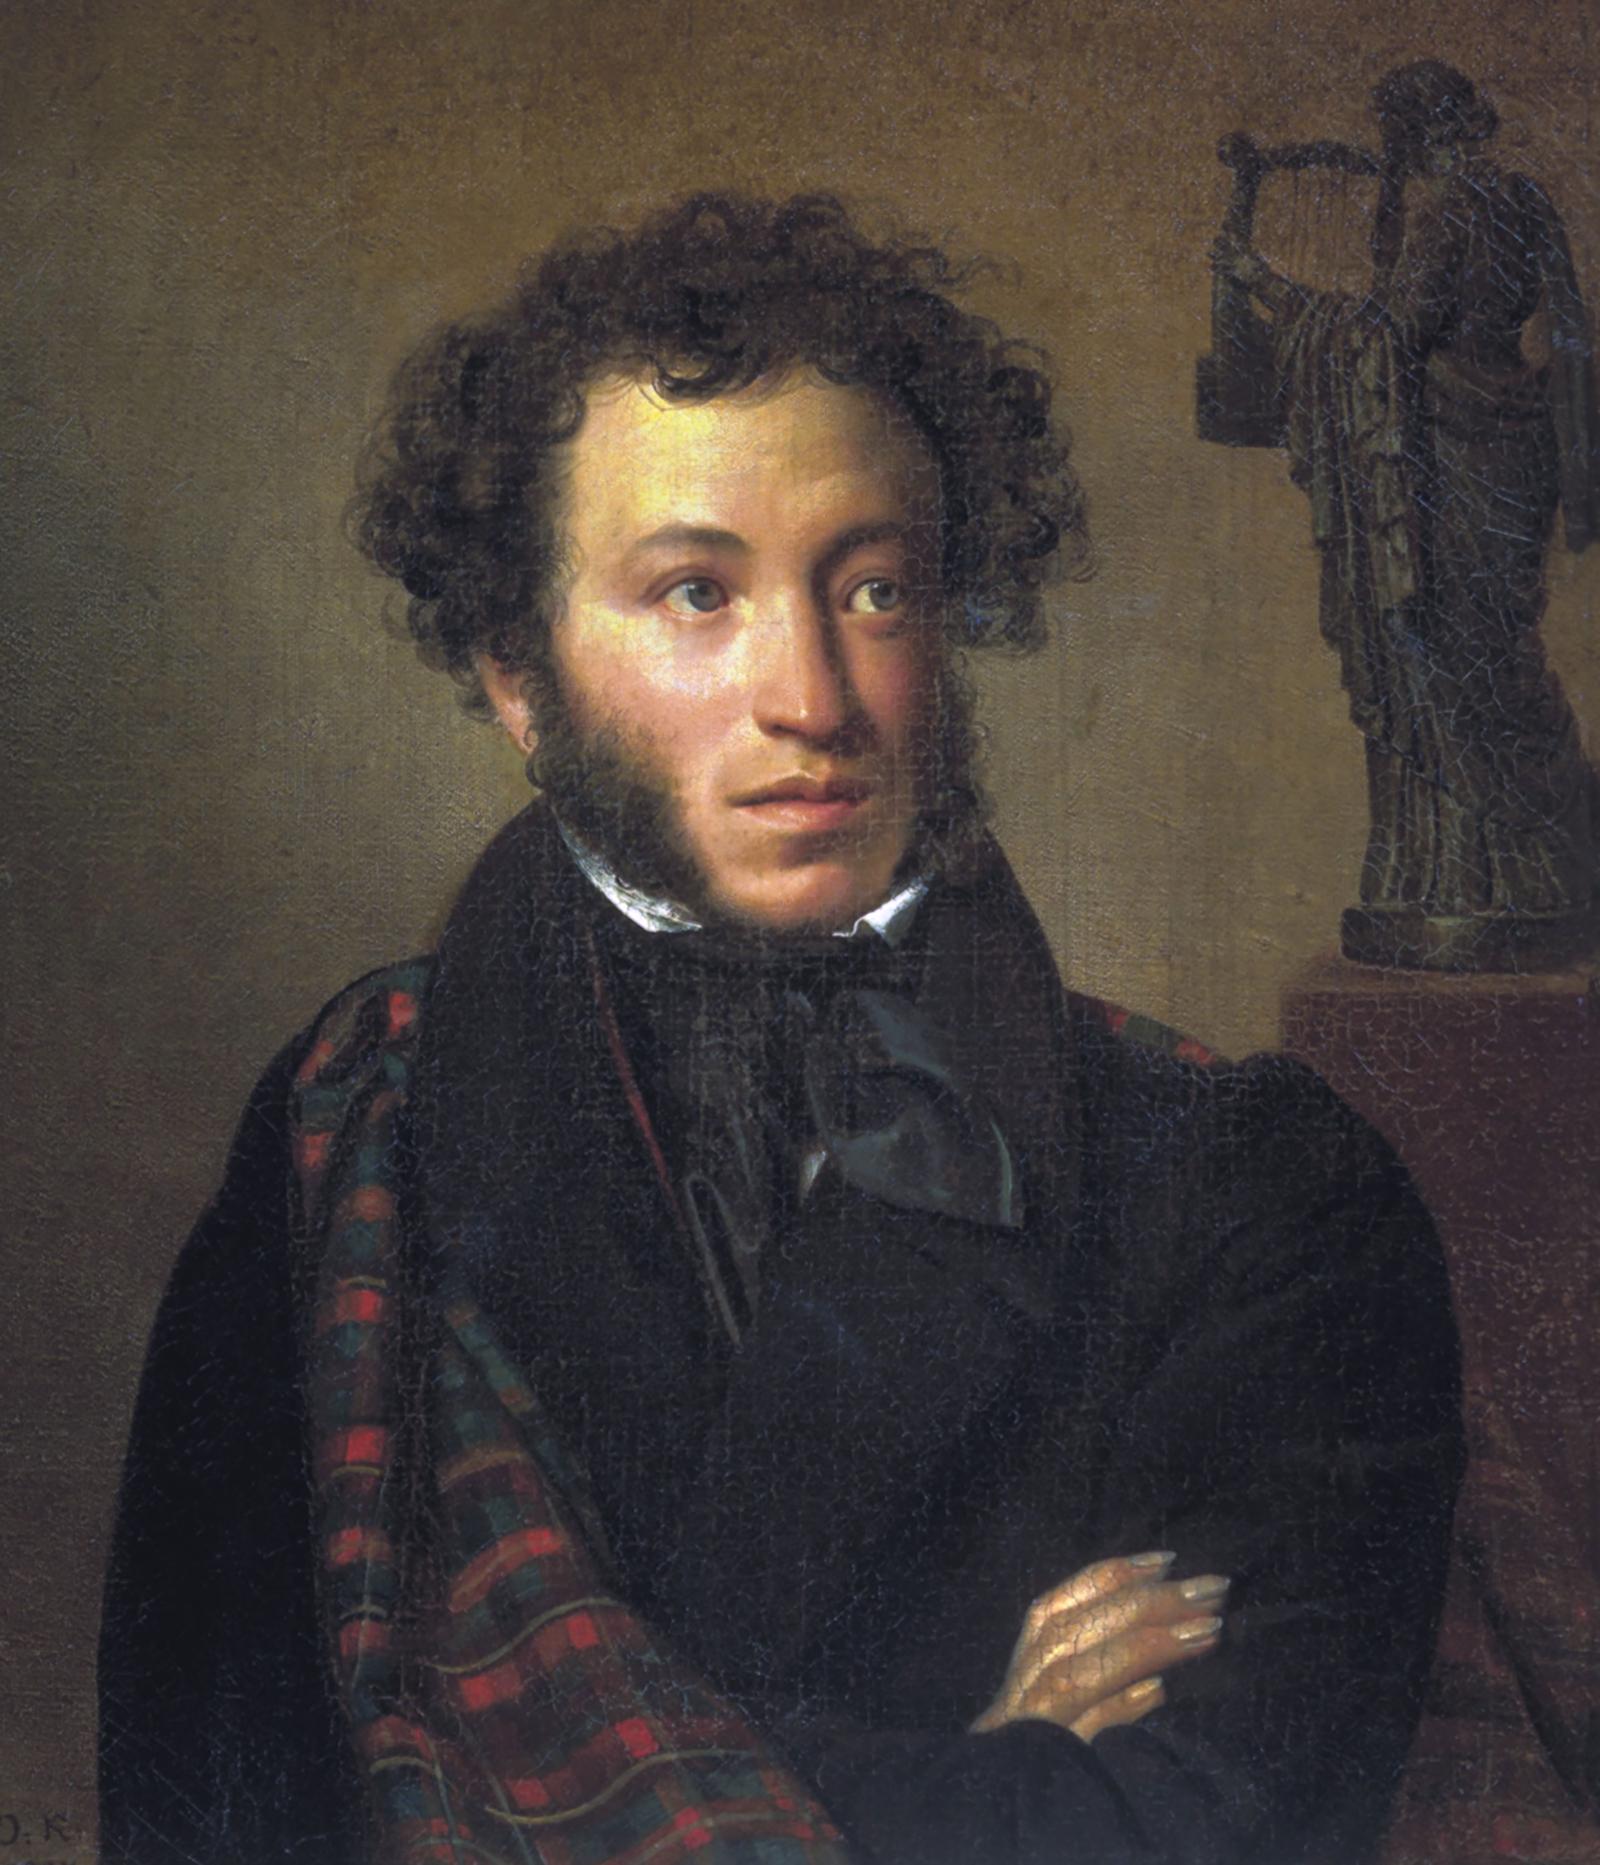 О. Кипренский. Портрет А. Пушкина. Фрагмент. 1827 год